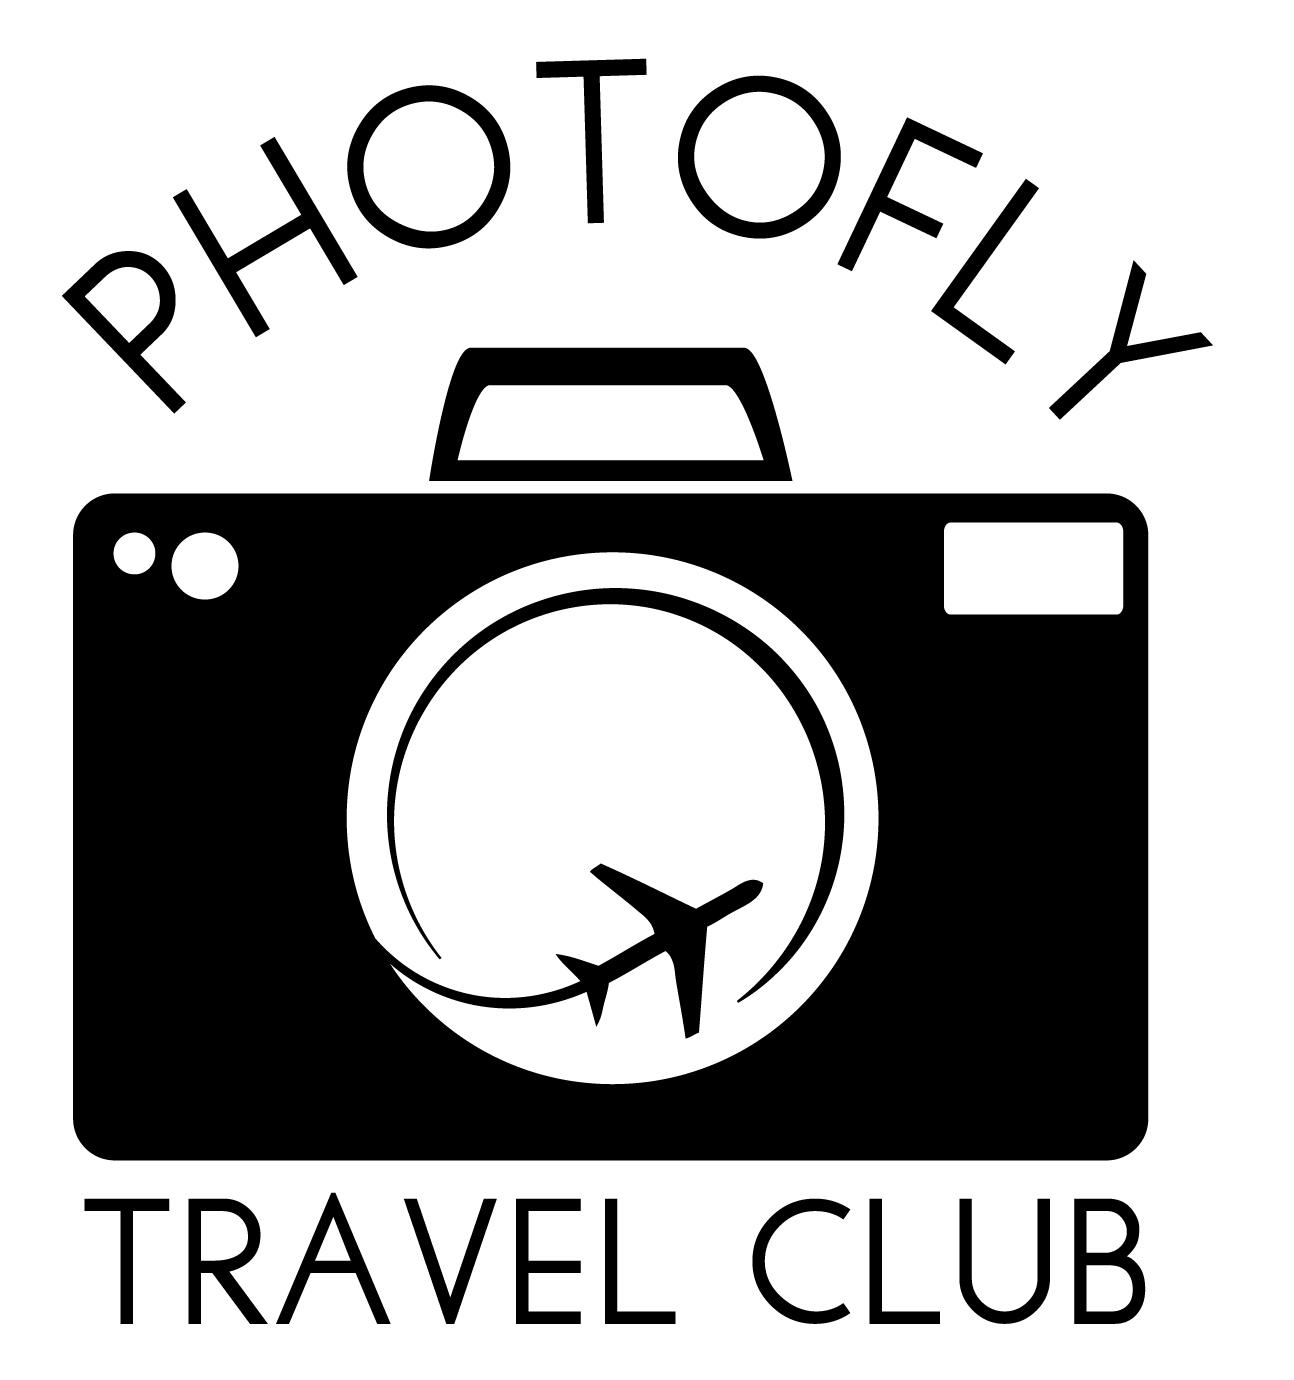 PhotoFly Travel Club   logo-final-2015   PhotoFly Travel Club